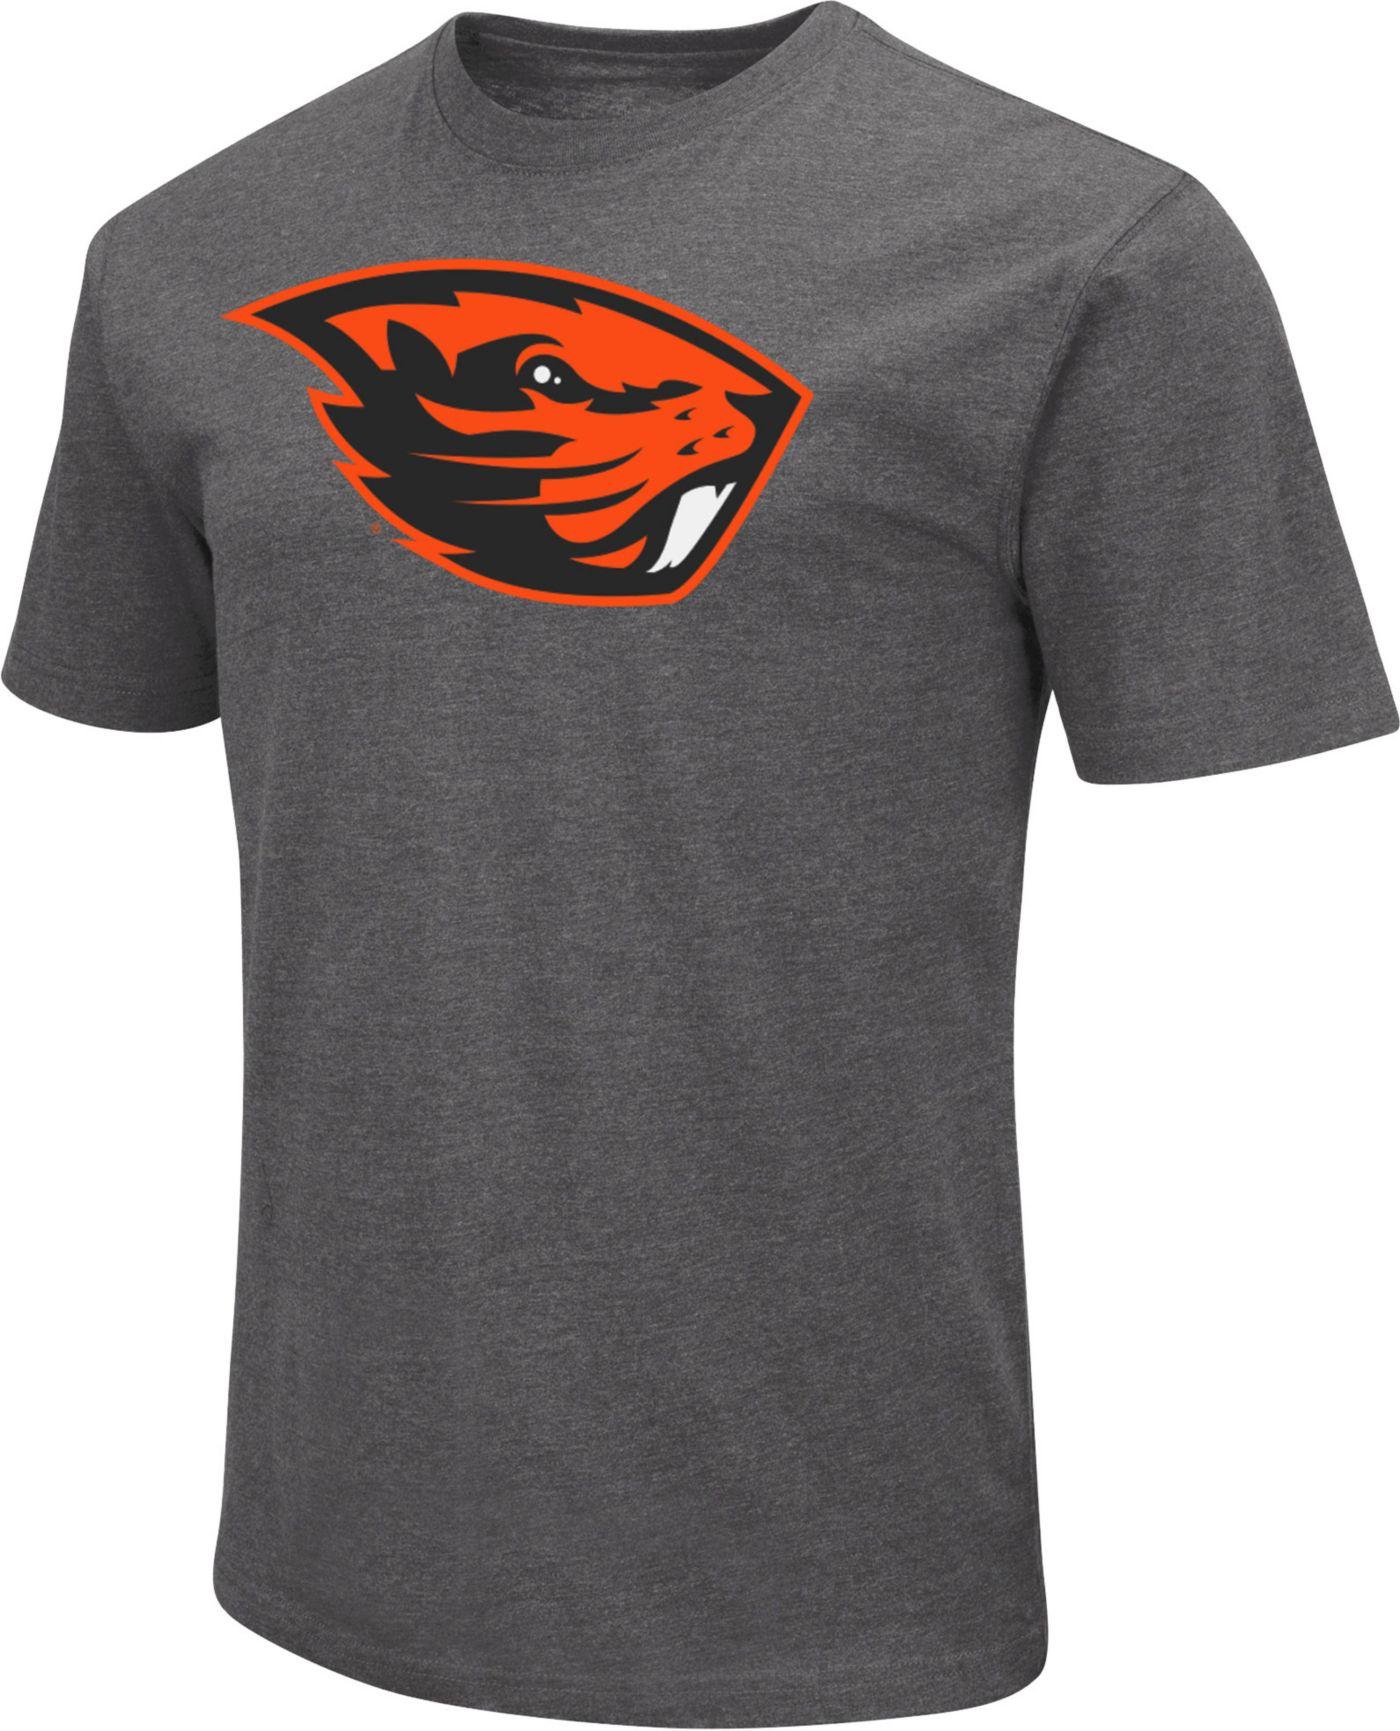 Colosseum Men's Oregon State Beavers Grey Dual Blend T-Shirt